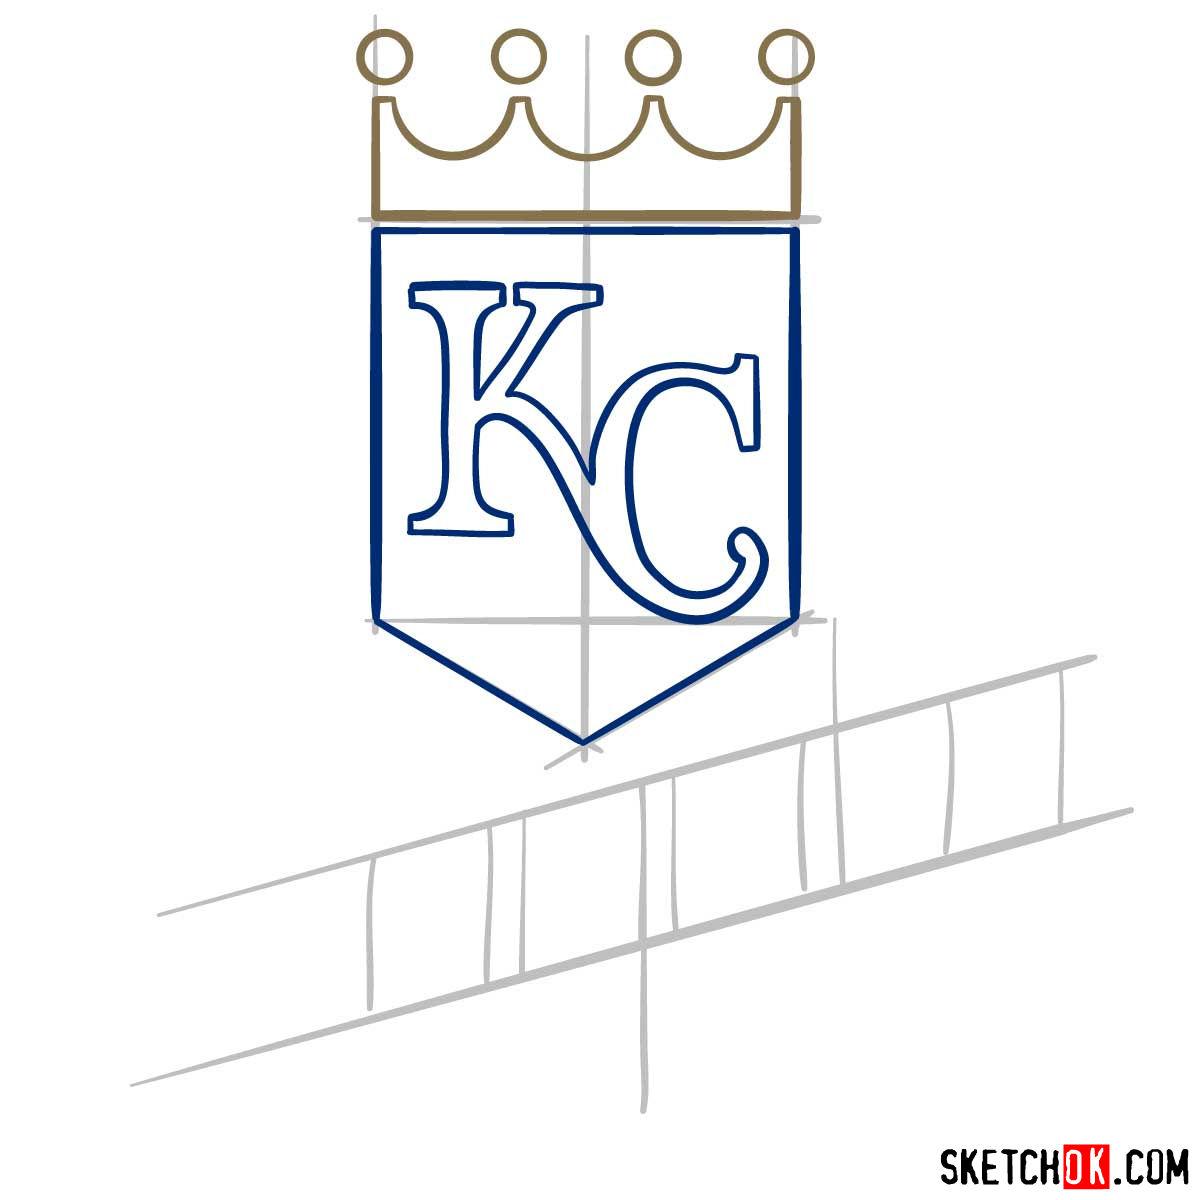 How to draw Kansas City Royals logo | MLB logos - step 05